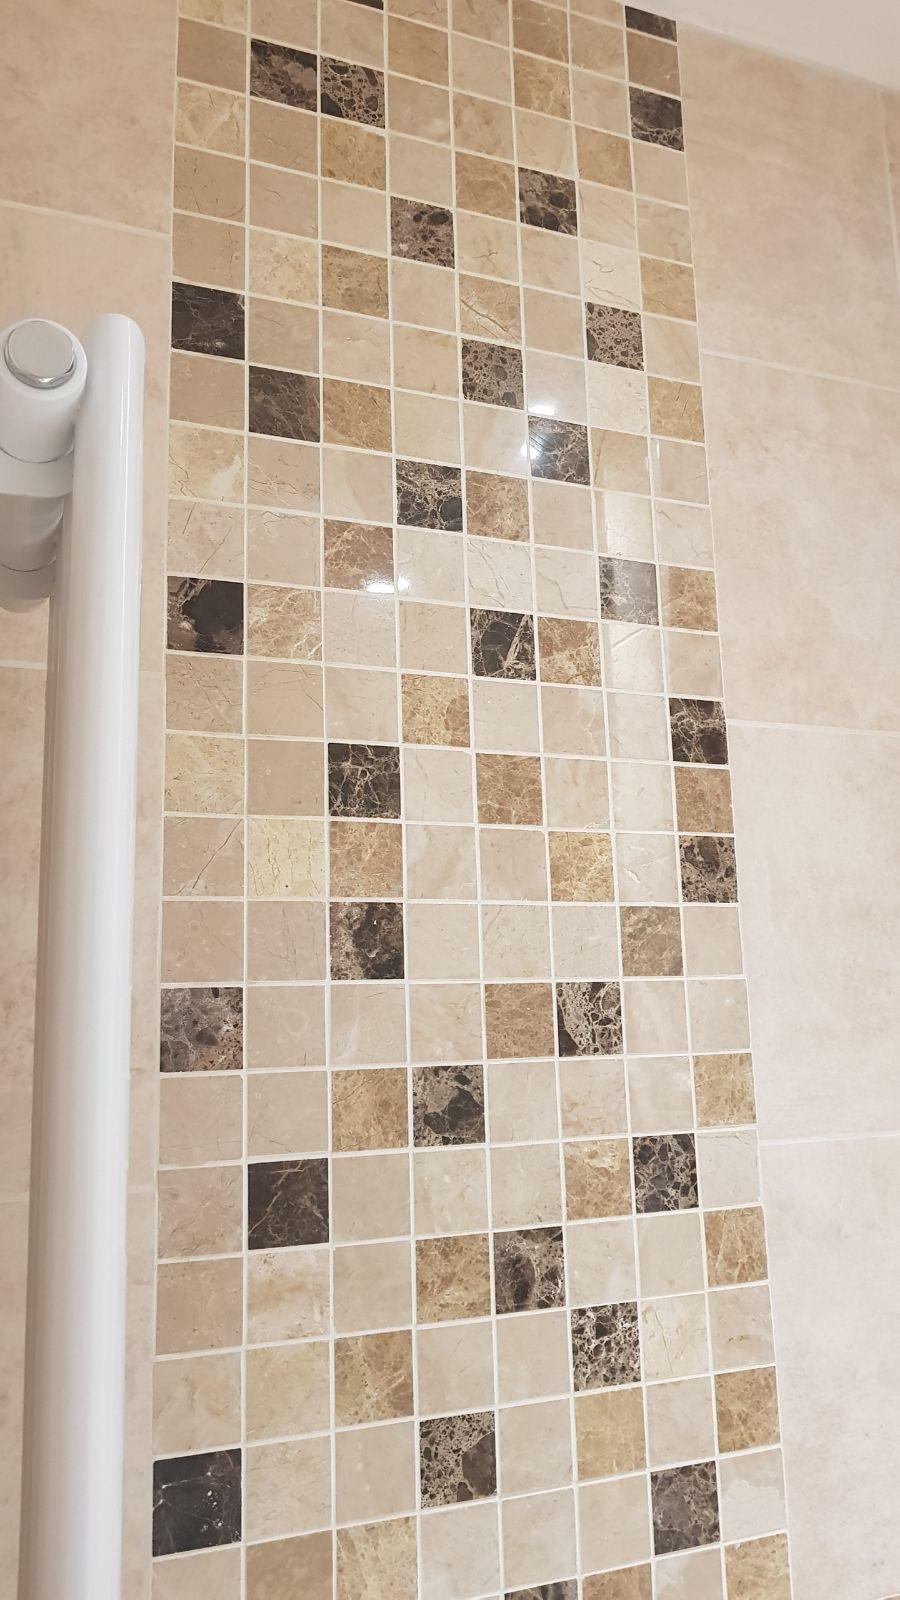 Installations of Bathrooms & Kitchens | JF Heating Engineers & Plumbing